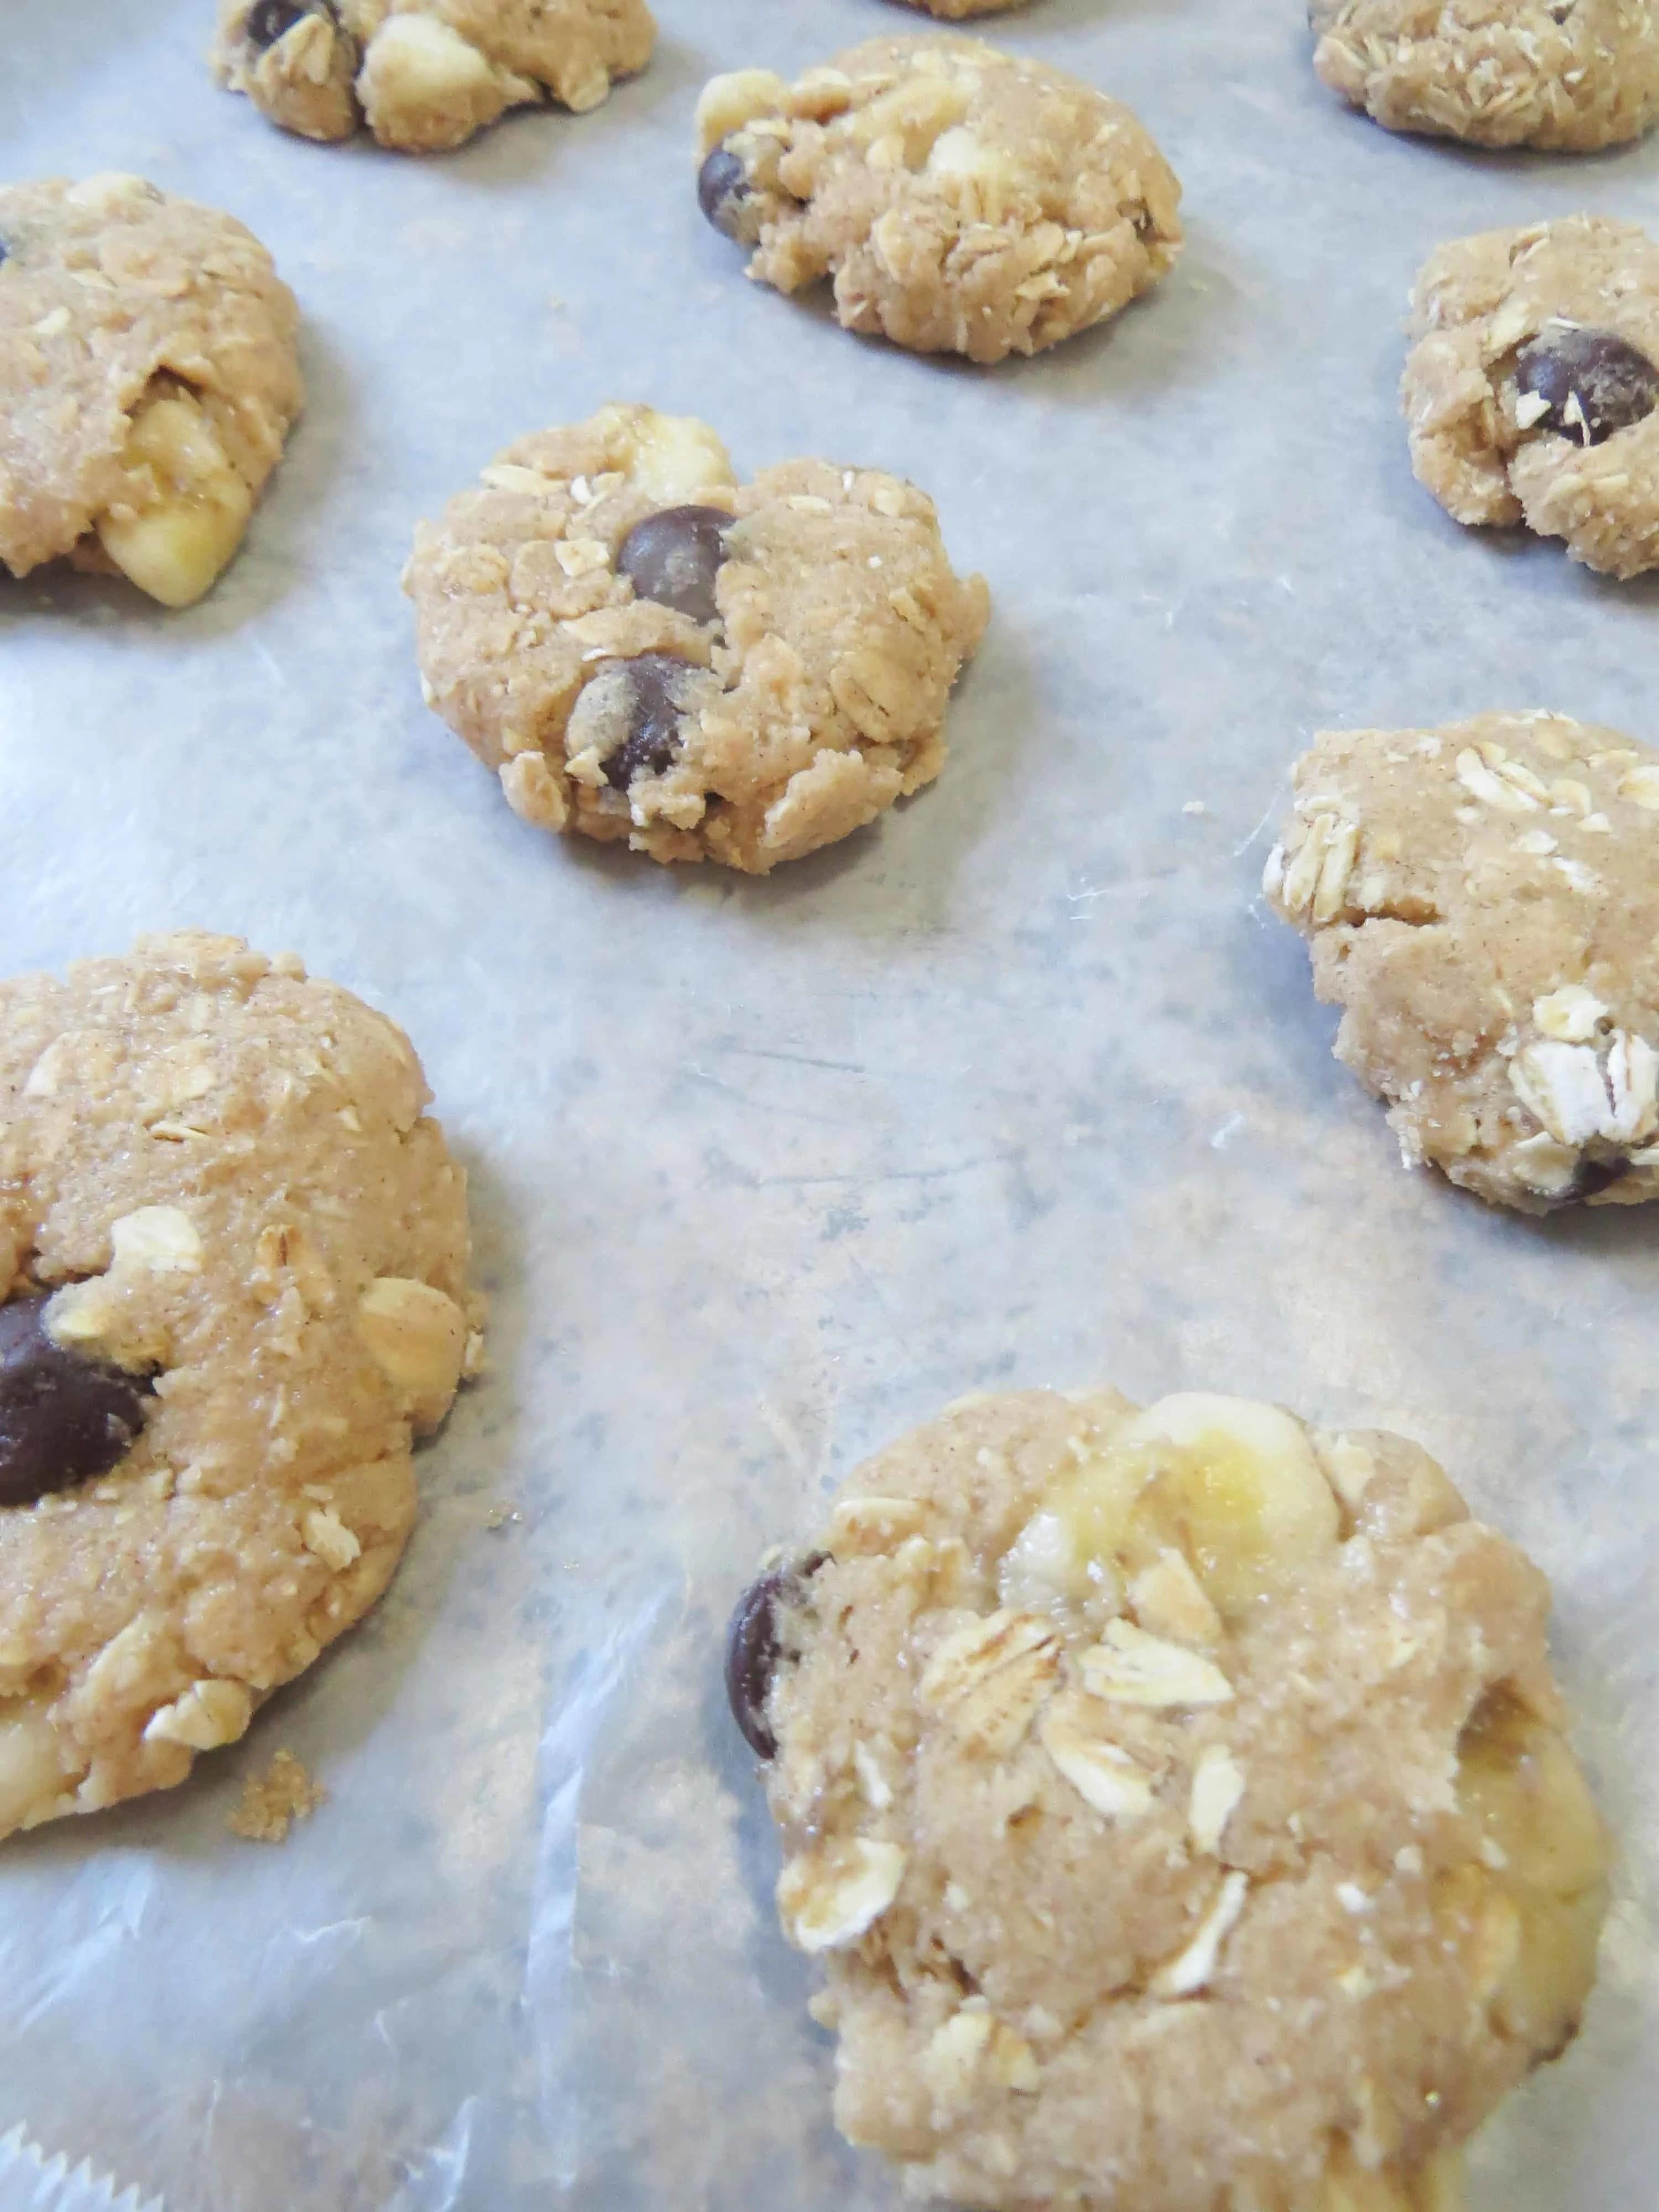 Oatmeal Banana Chocolate Chip Cookies on baking sheet